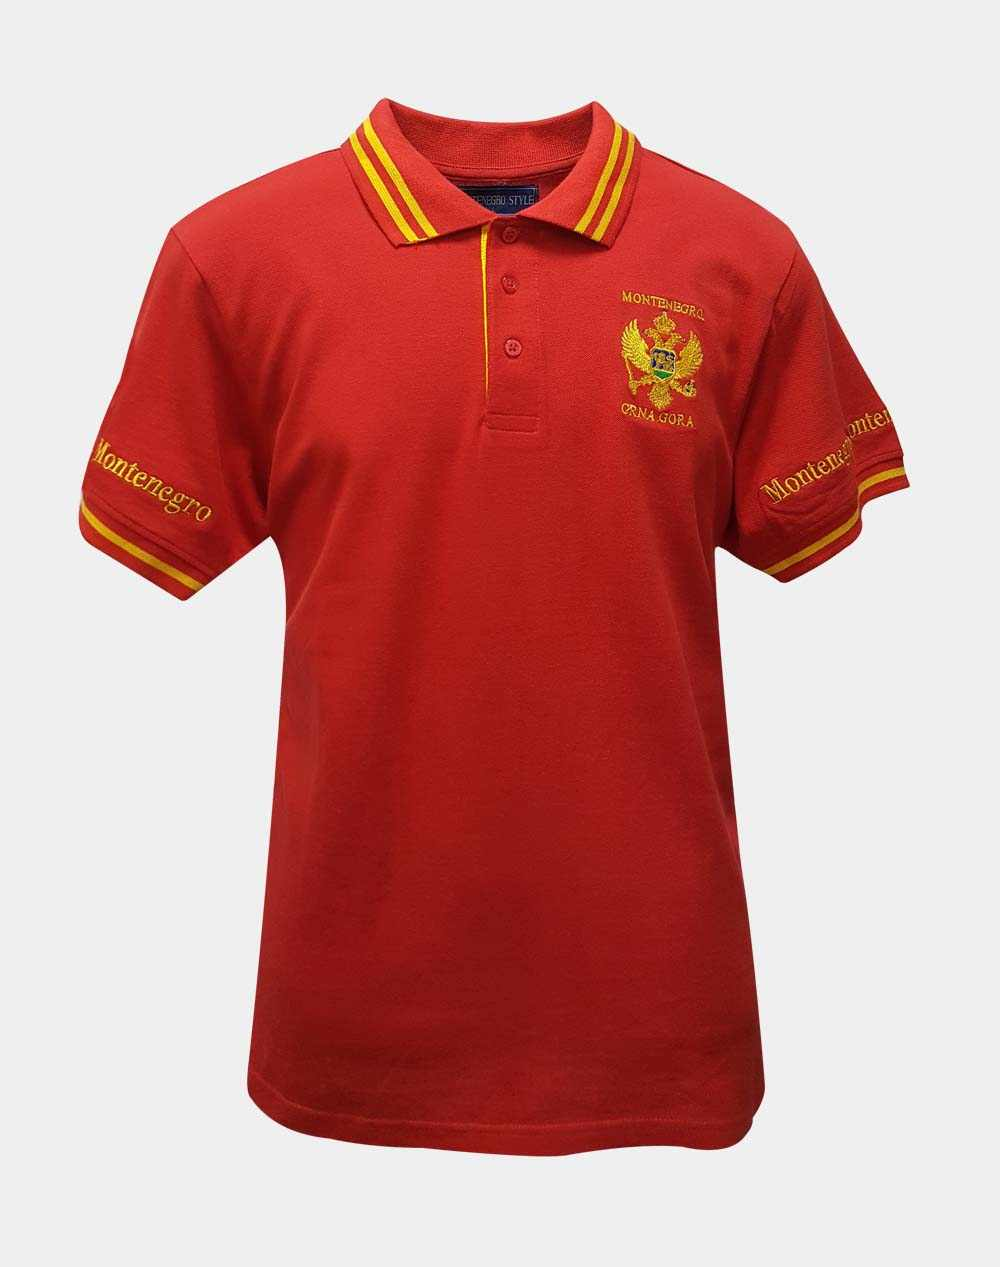 Polo Shirt Manufacturer, Polo shirts Factory in Bangladesh, Manufacturer, Supplier, Exporter